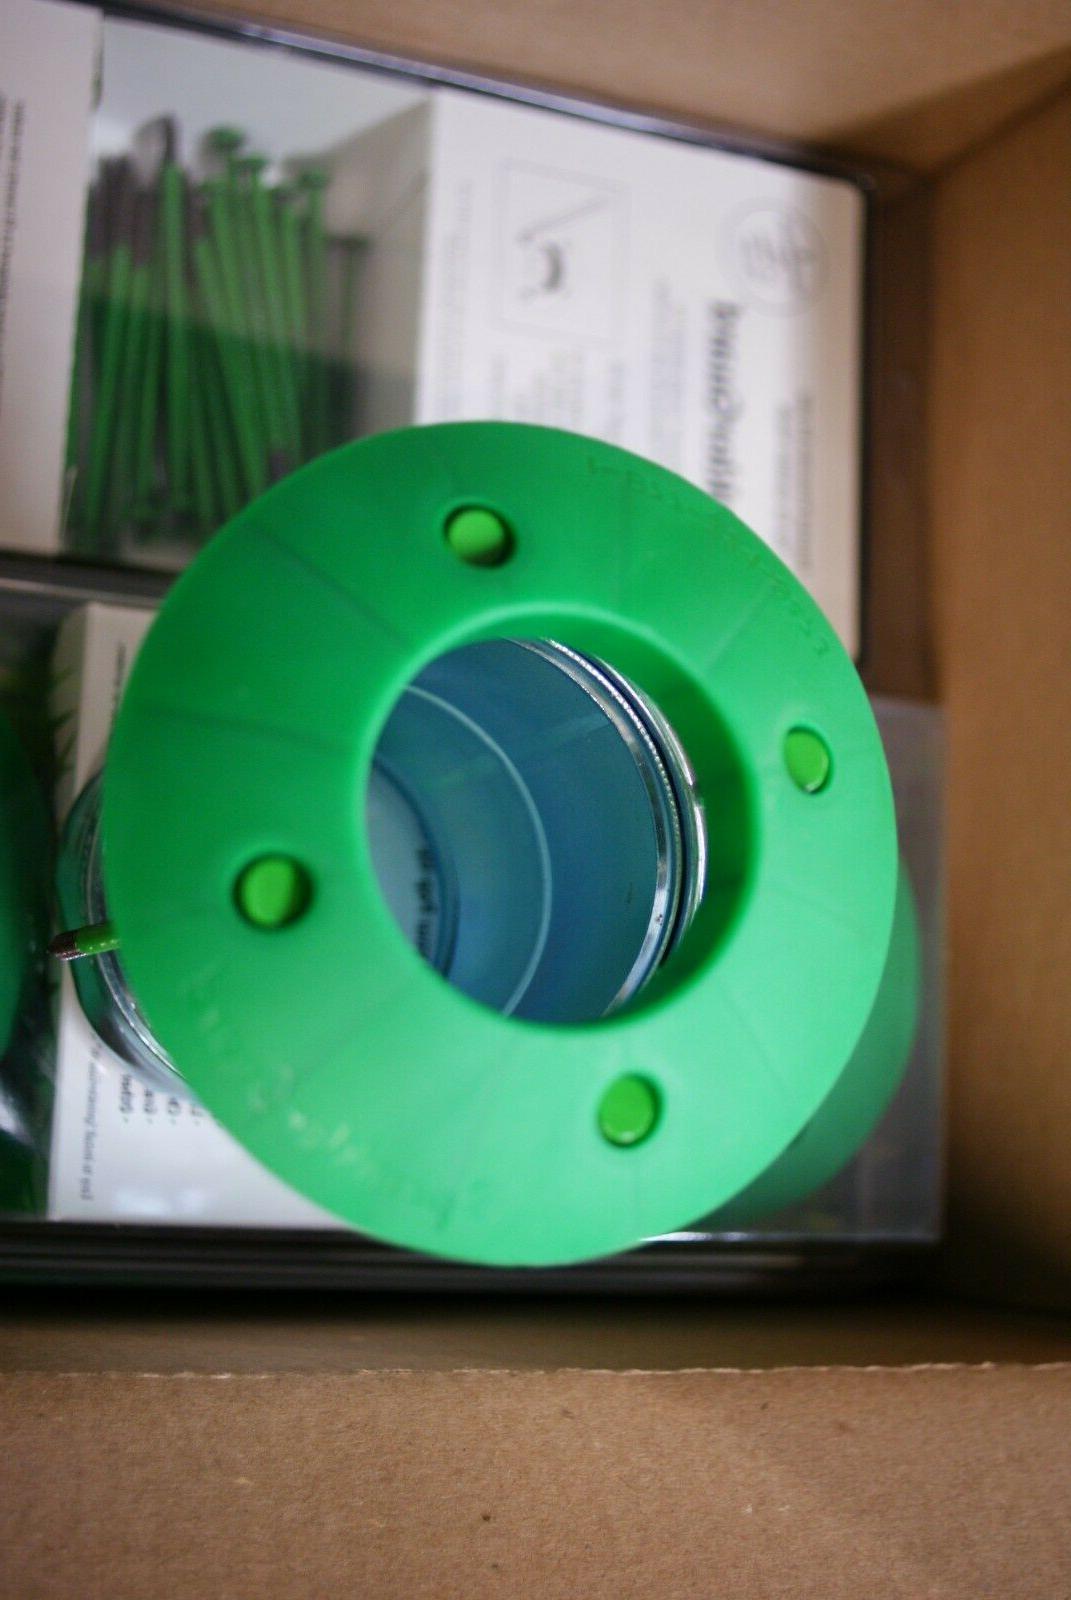 12 SprinklerGuard Donut Spray Guards 48 metal Spikes - Protection